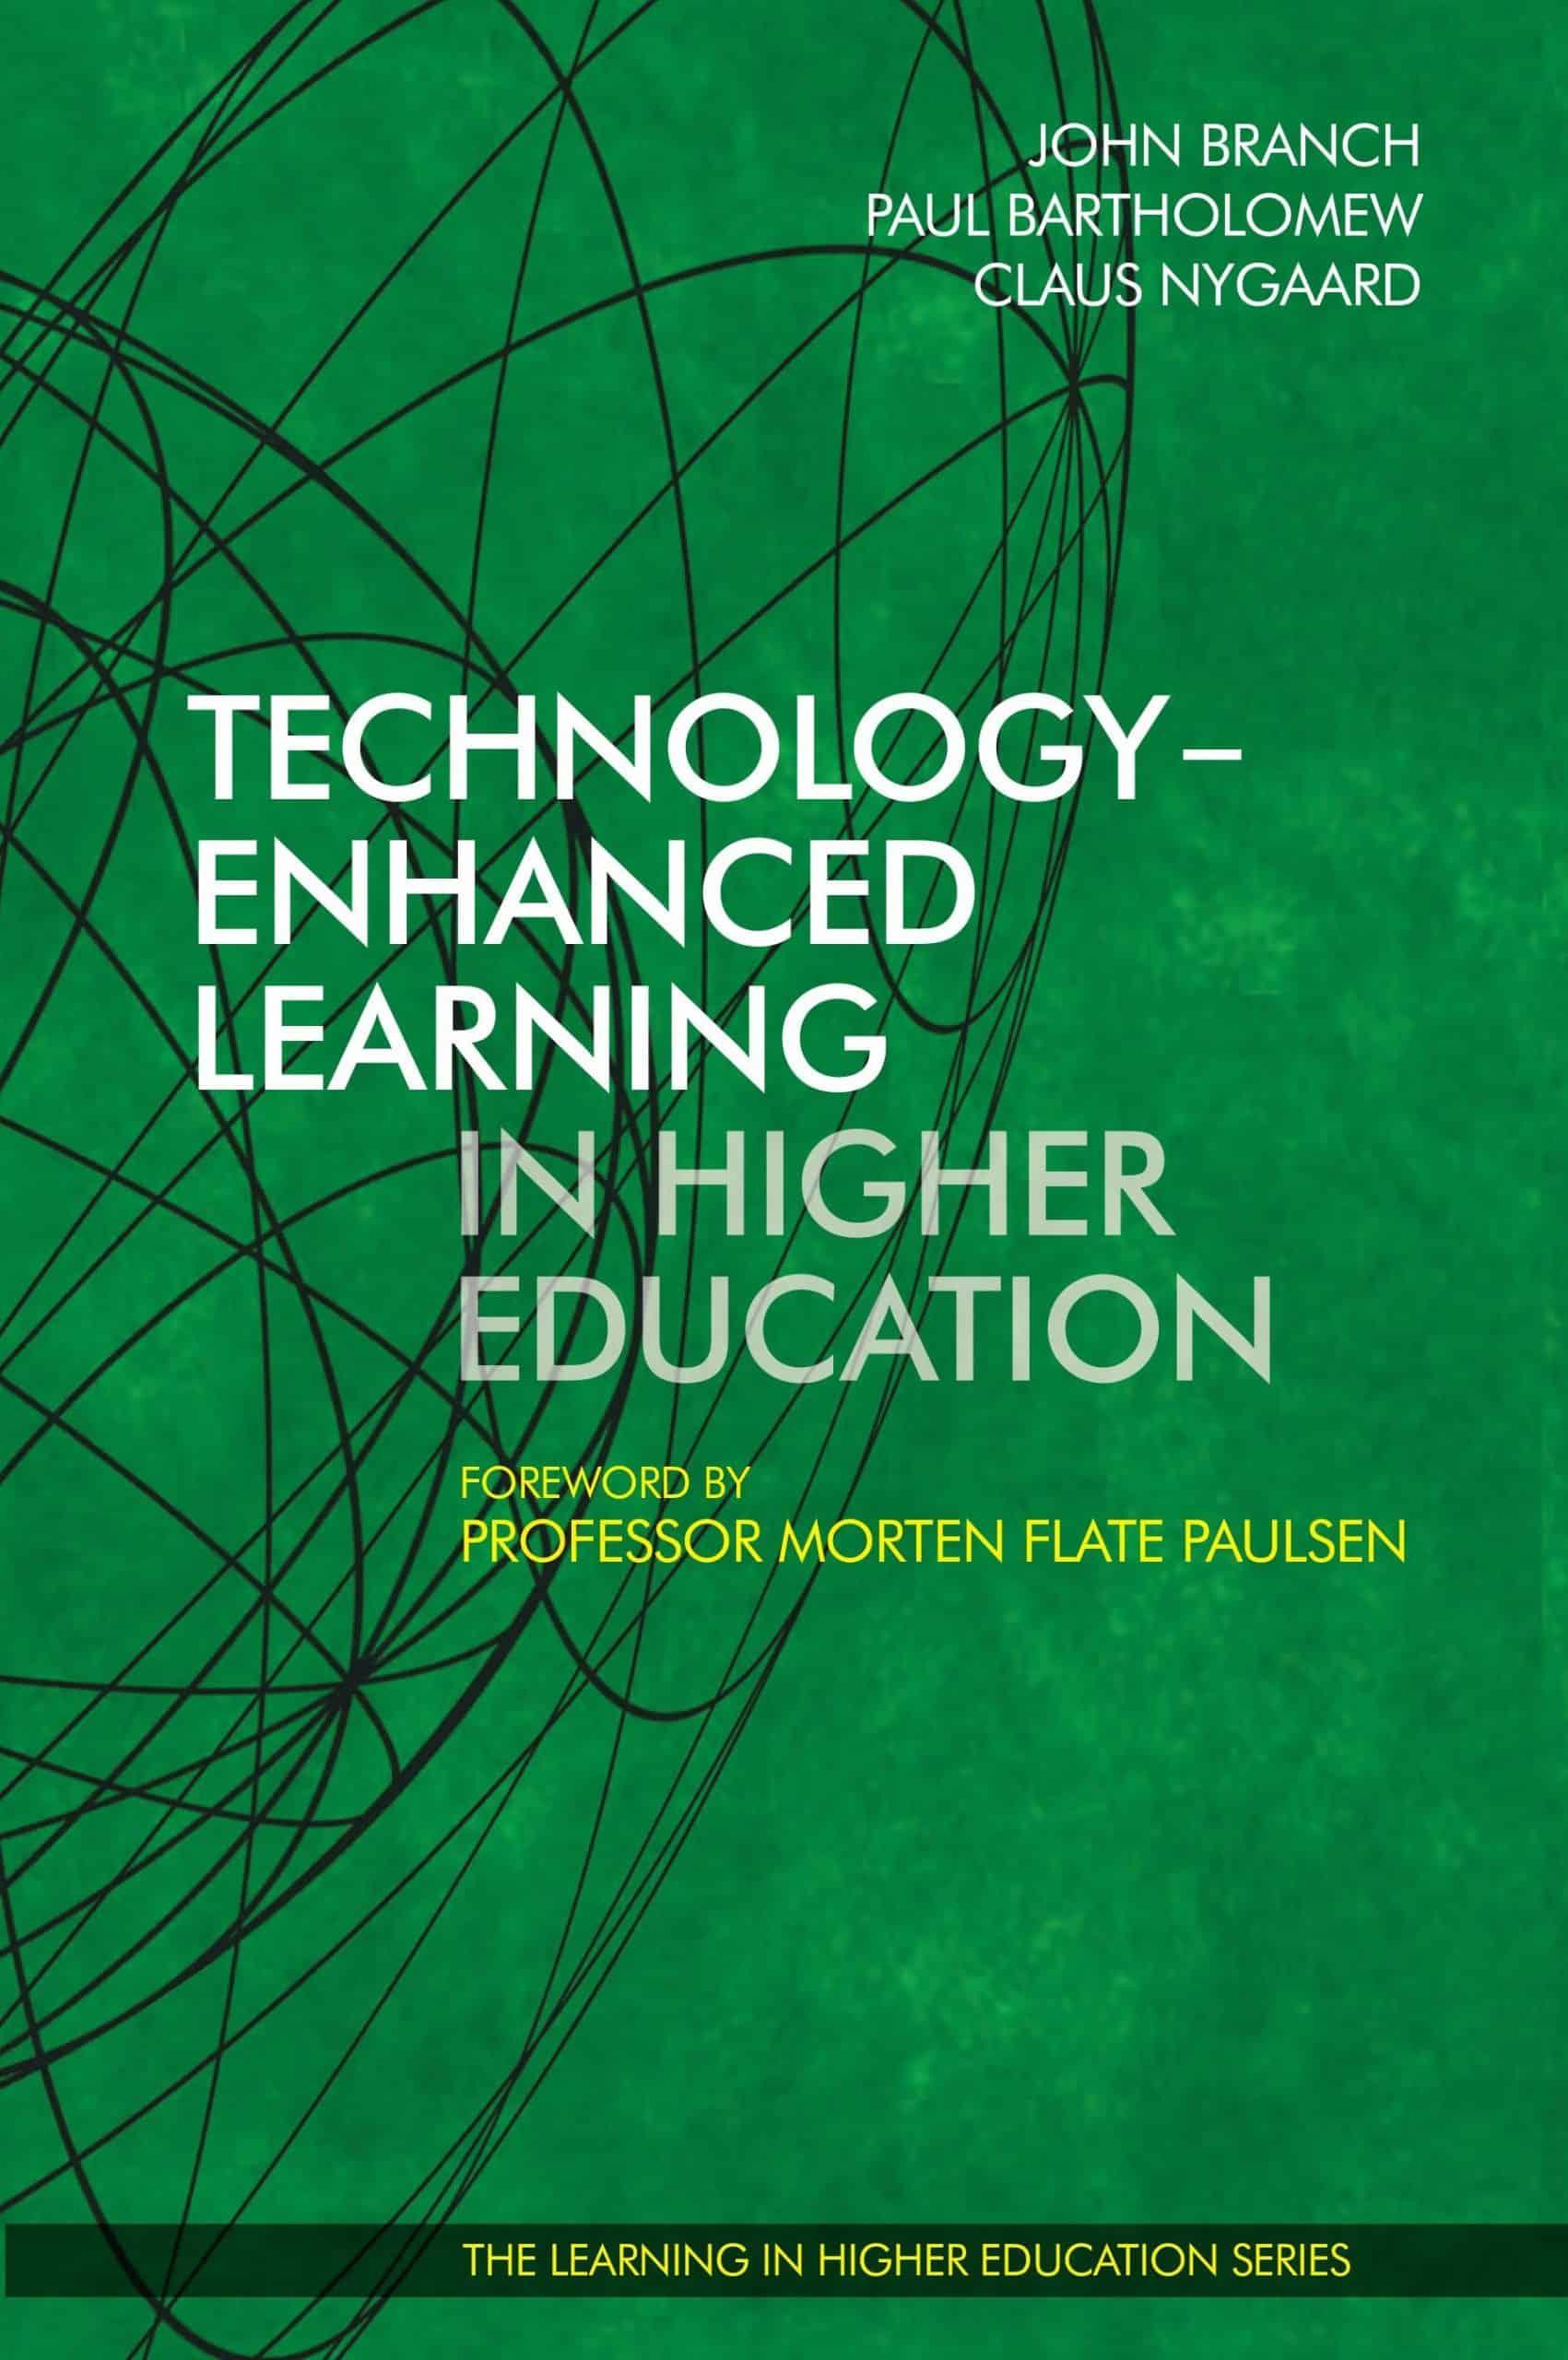 Technology-Enhanced Learning in Higher Education (2015) - John Branch - Paul Bartholomew - Claus Nygaard - Morten Flate Paulsen - Libri Publishing Ltd - Institute for Learning in Higher Education